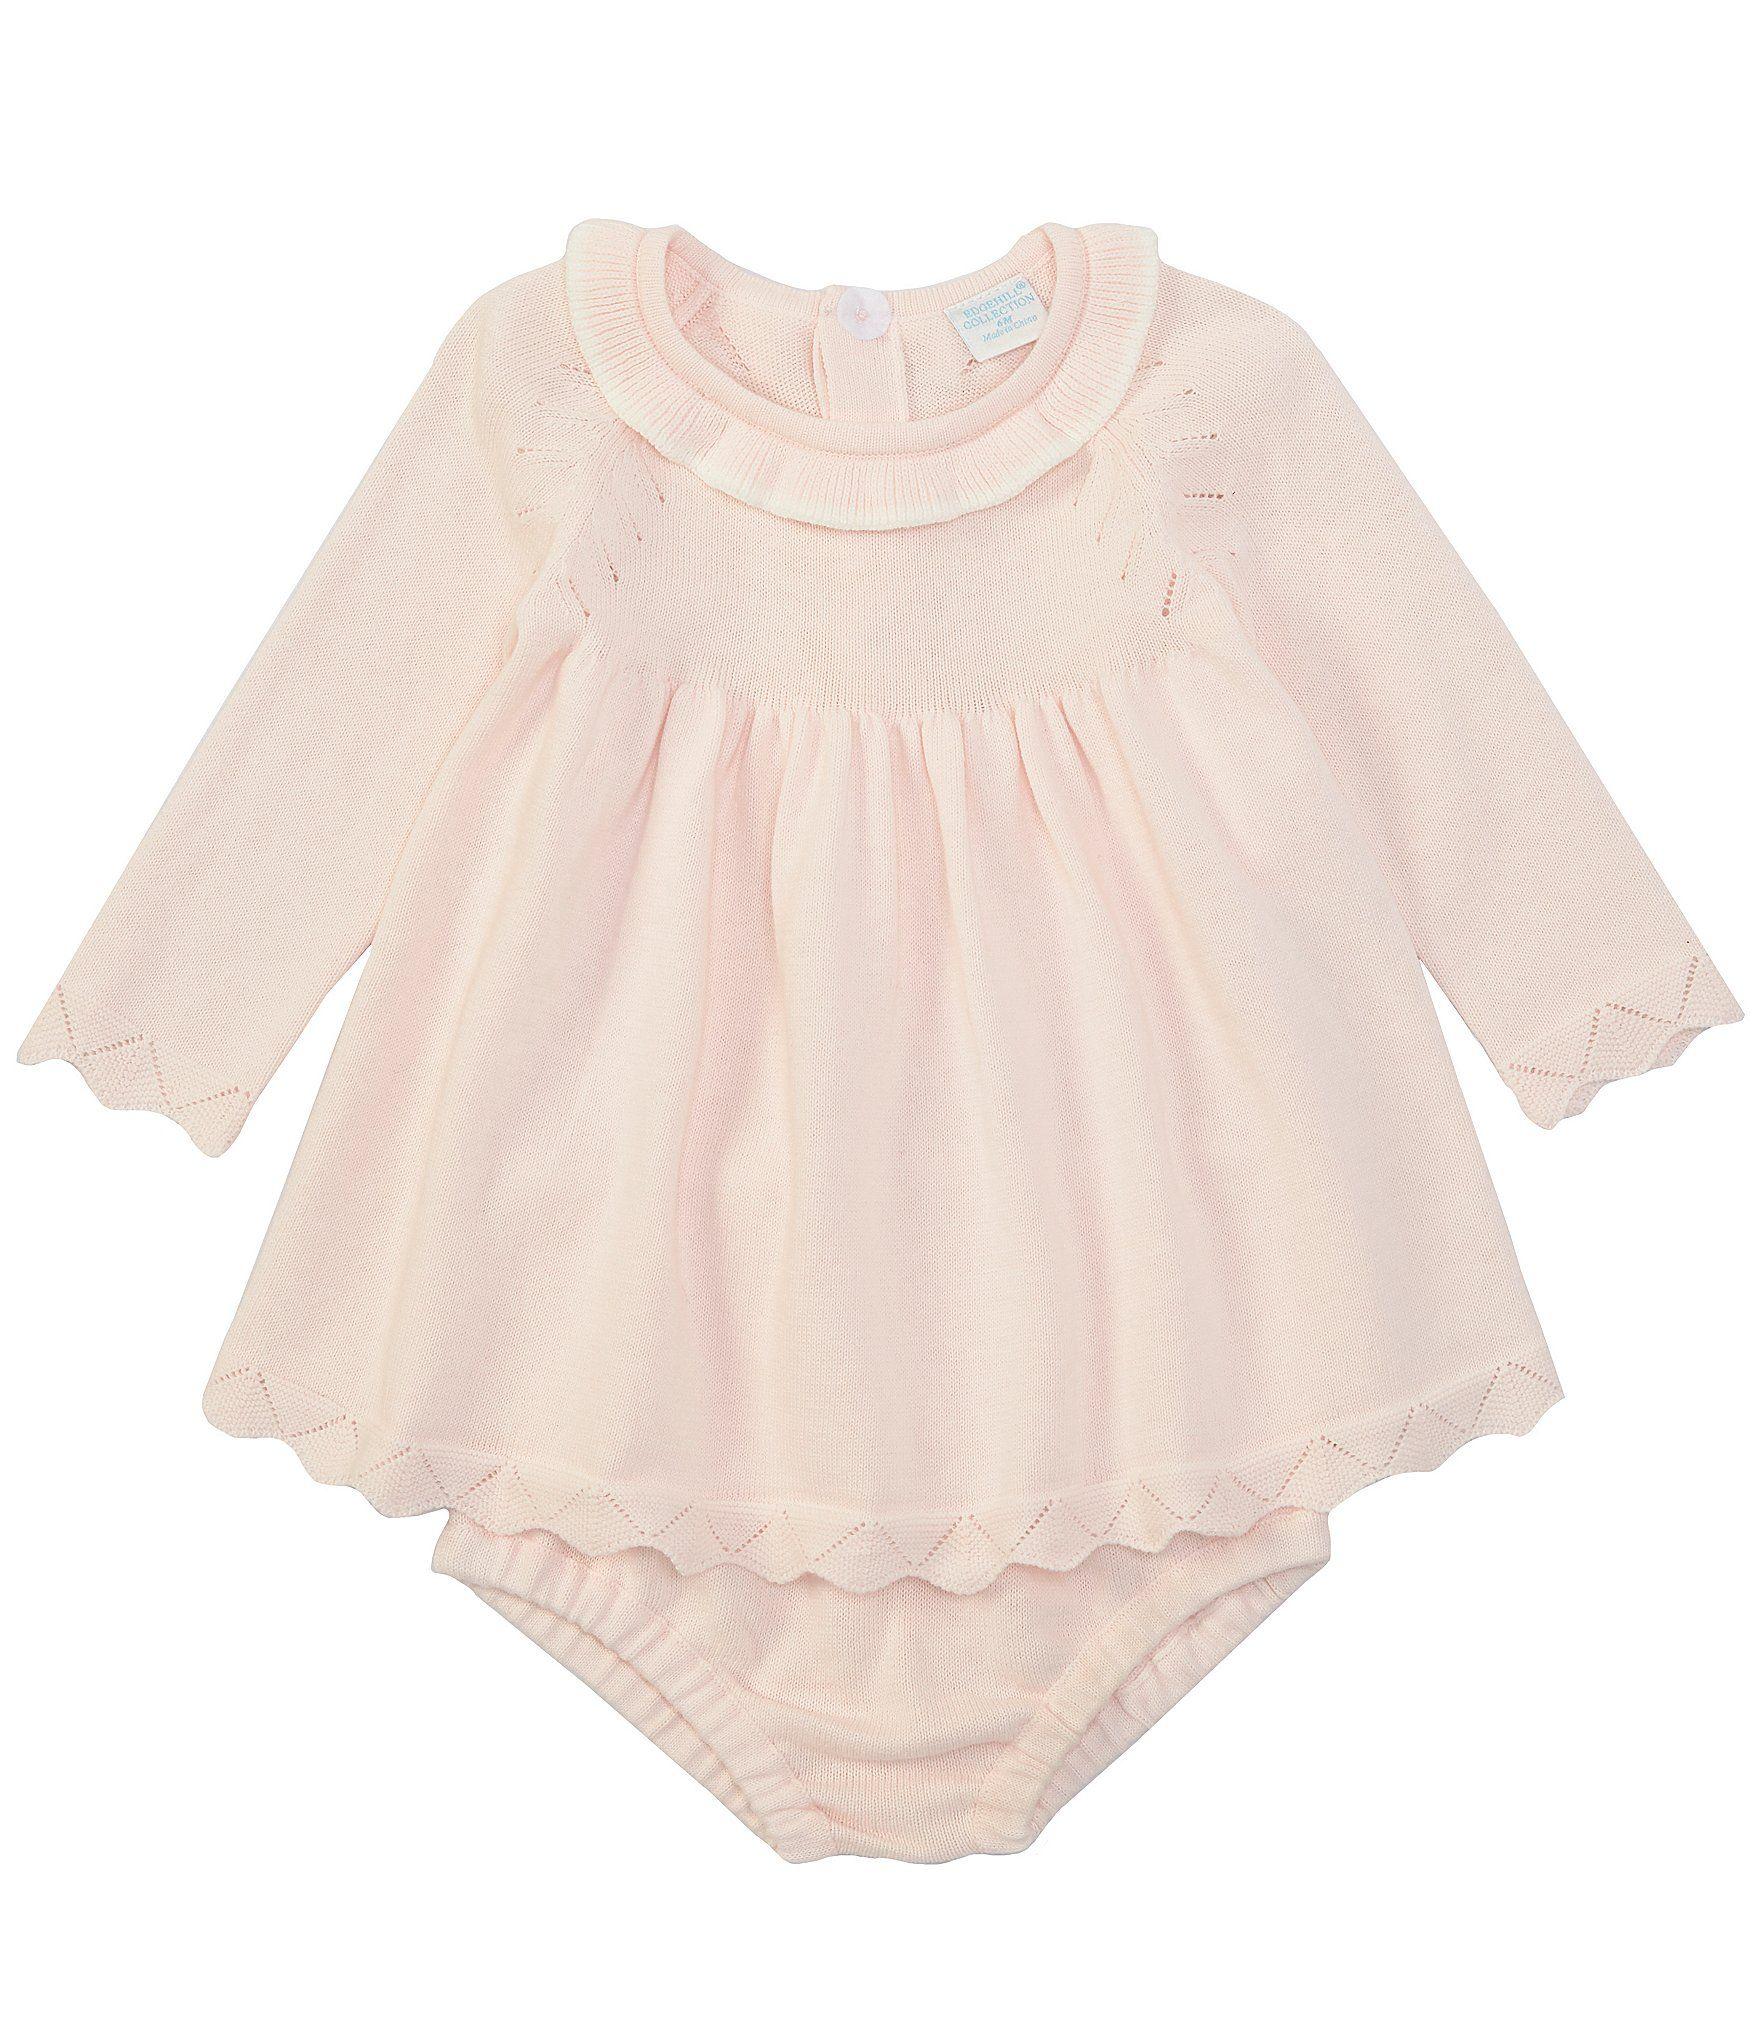 Photo of Edgehill Collection Baby Girls Newborn-6 Months Sweater Knit Dress – Pink Newborn